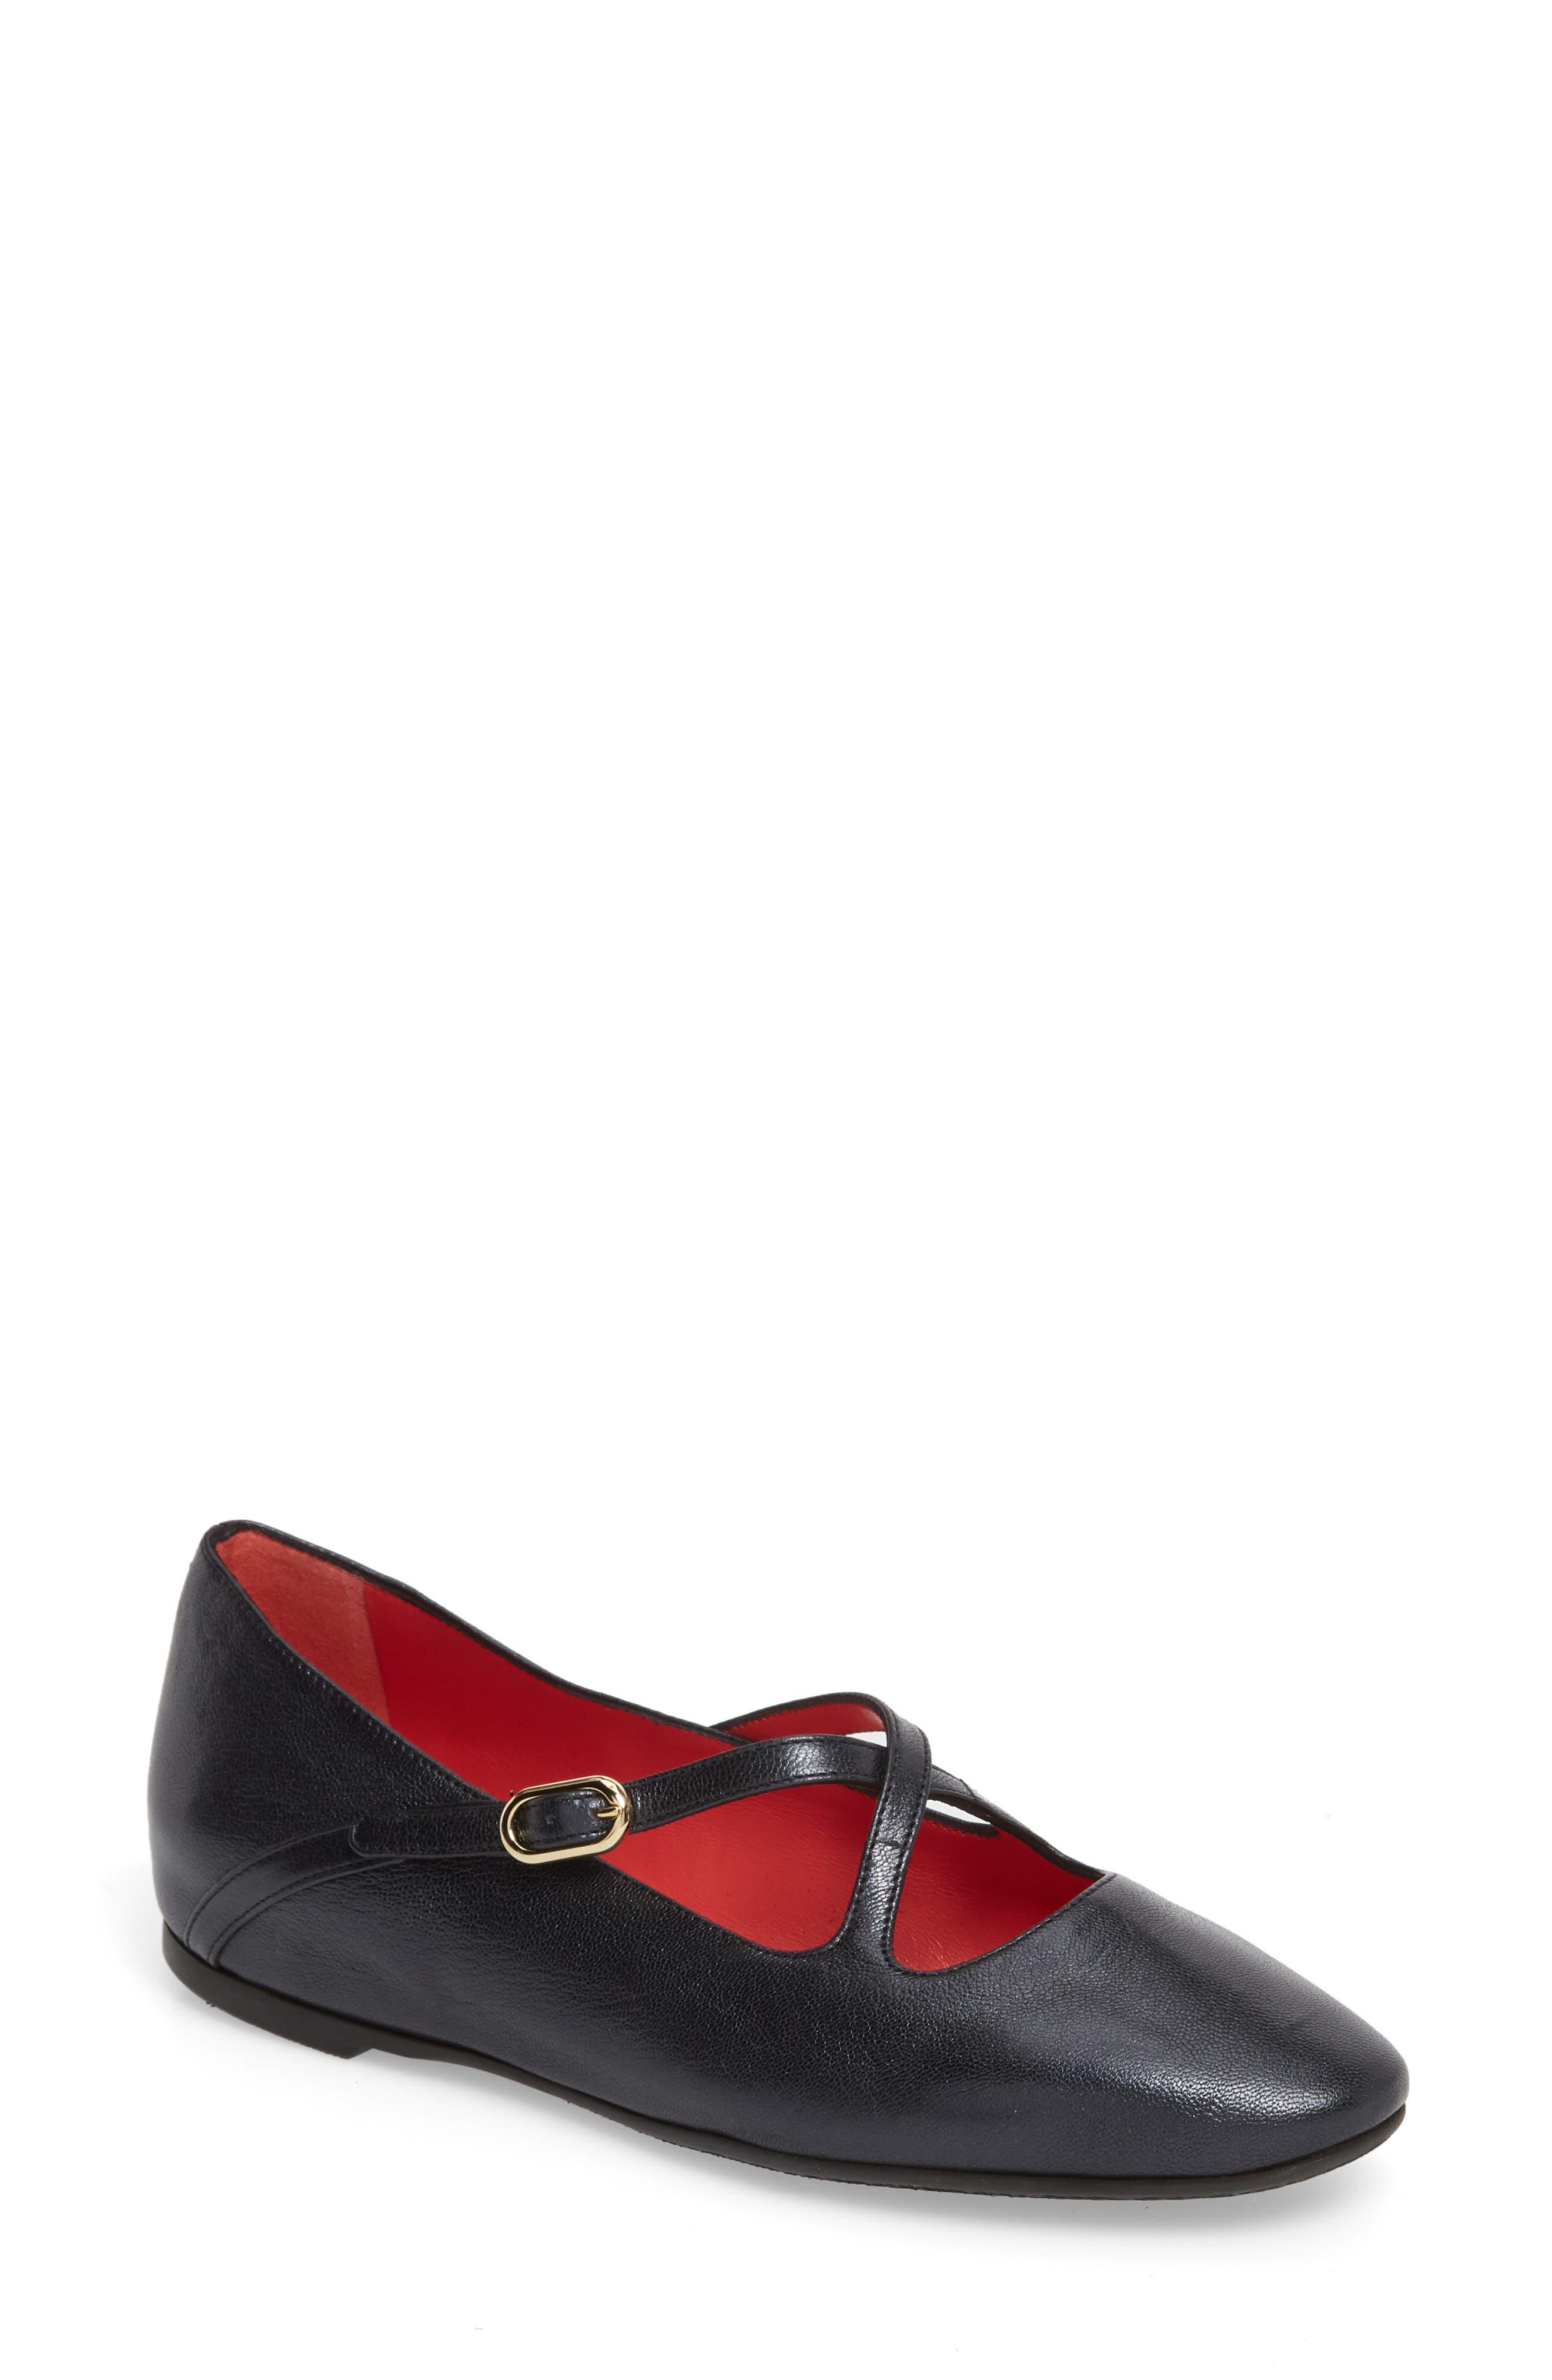 Dafne Flat,                         Main,                         color, Black Leather